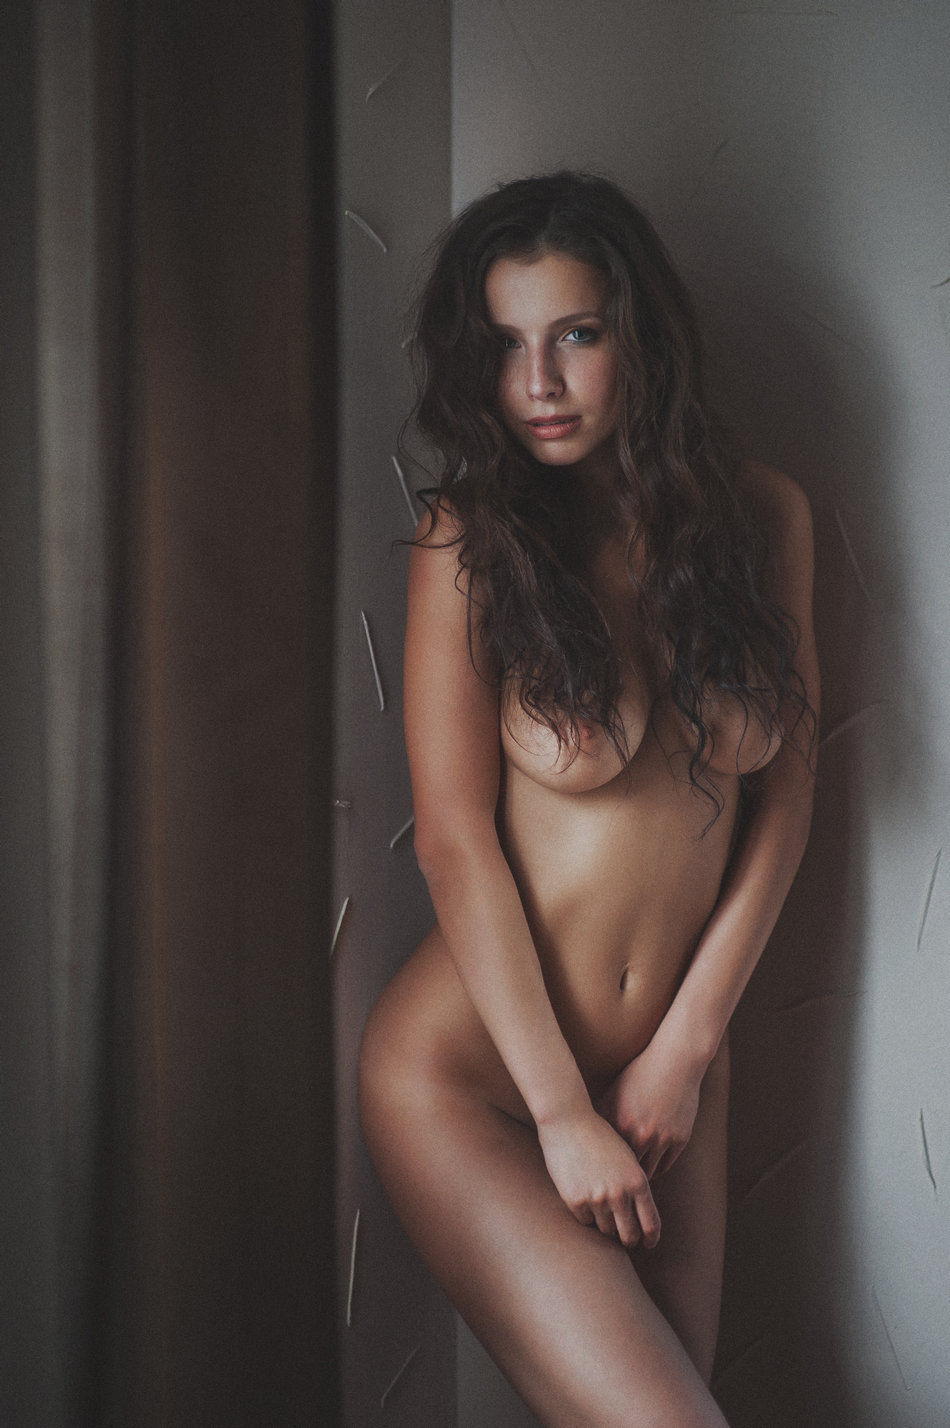 Erotic gallery photography public